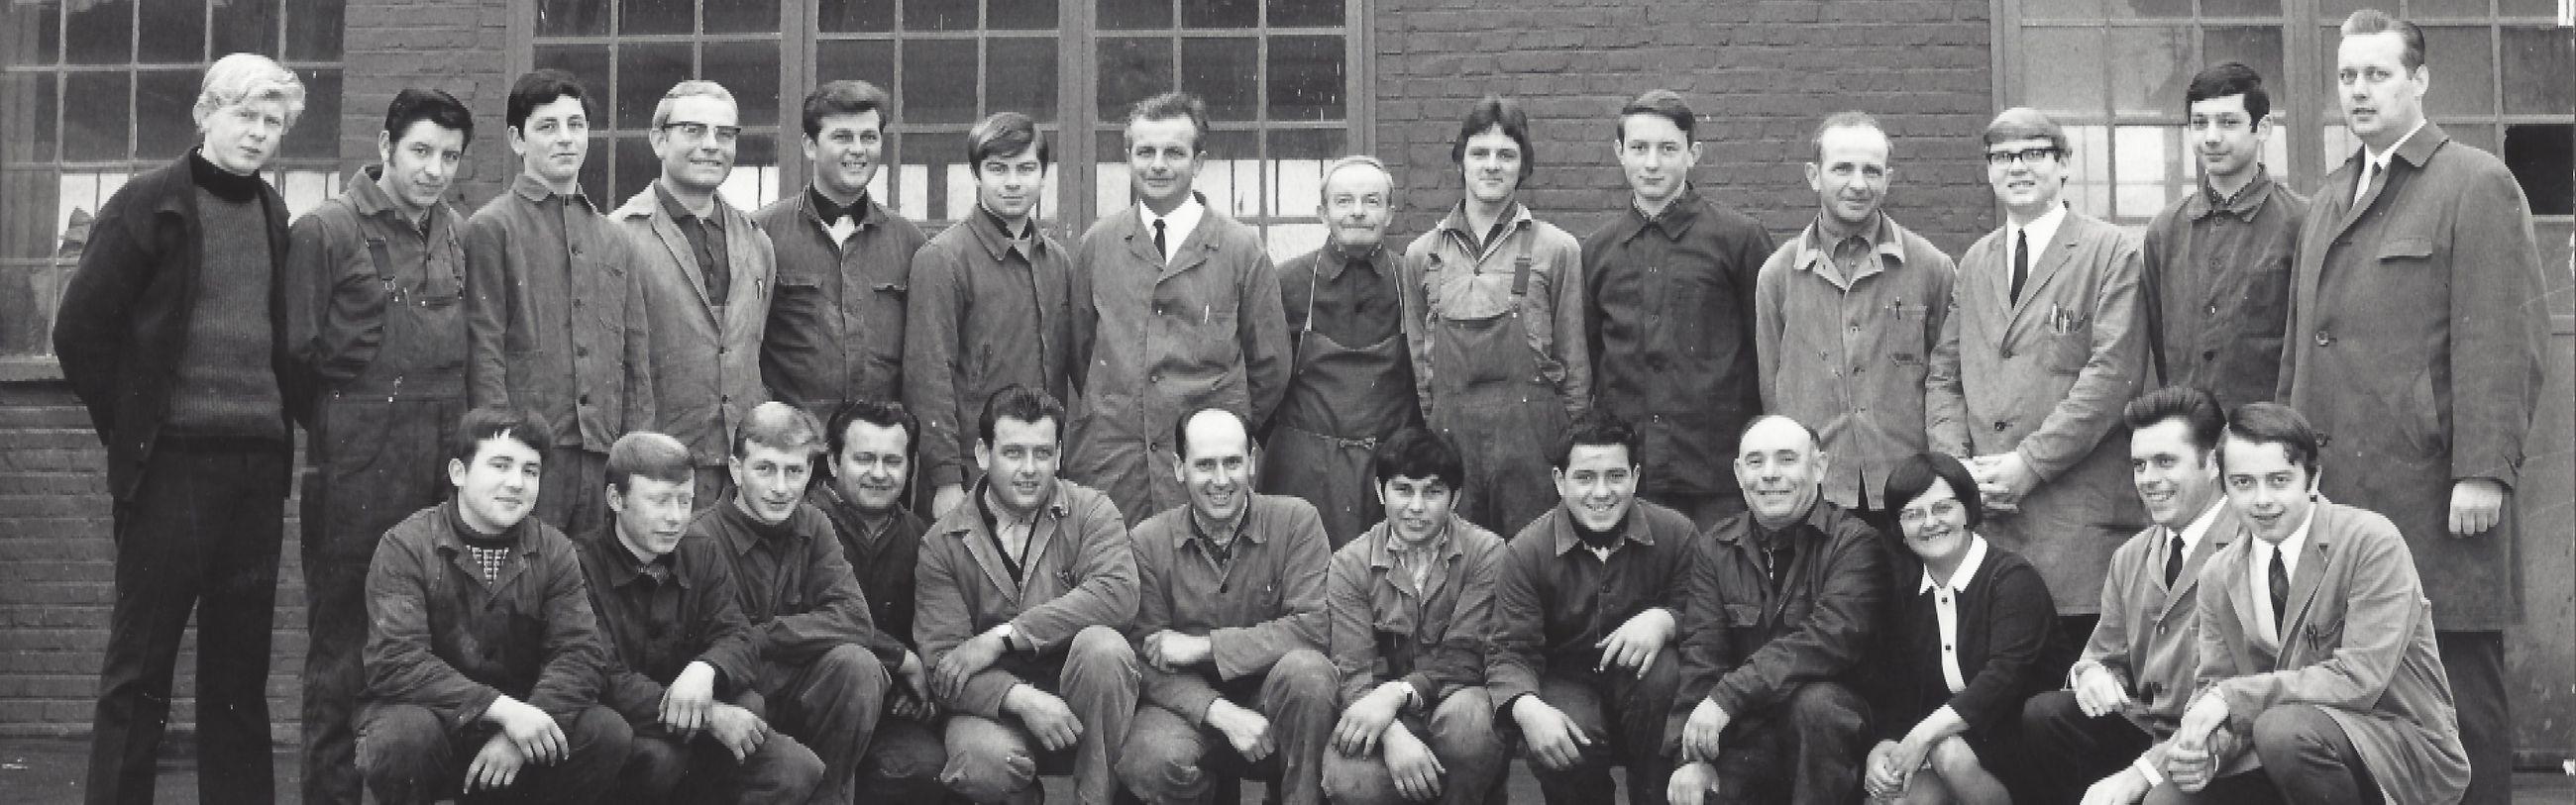 Gruppenbild 1969